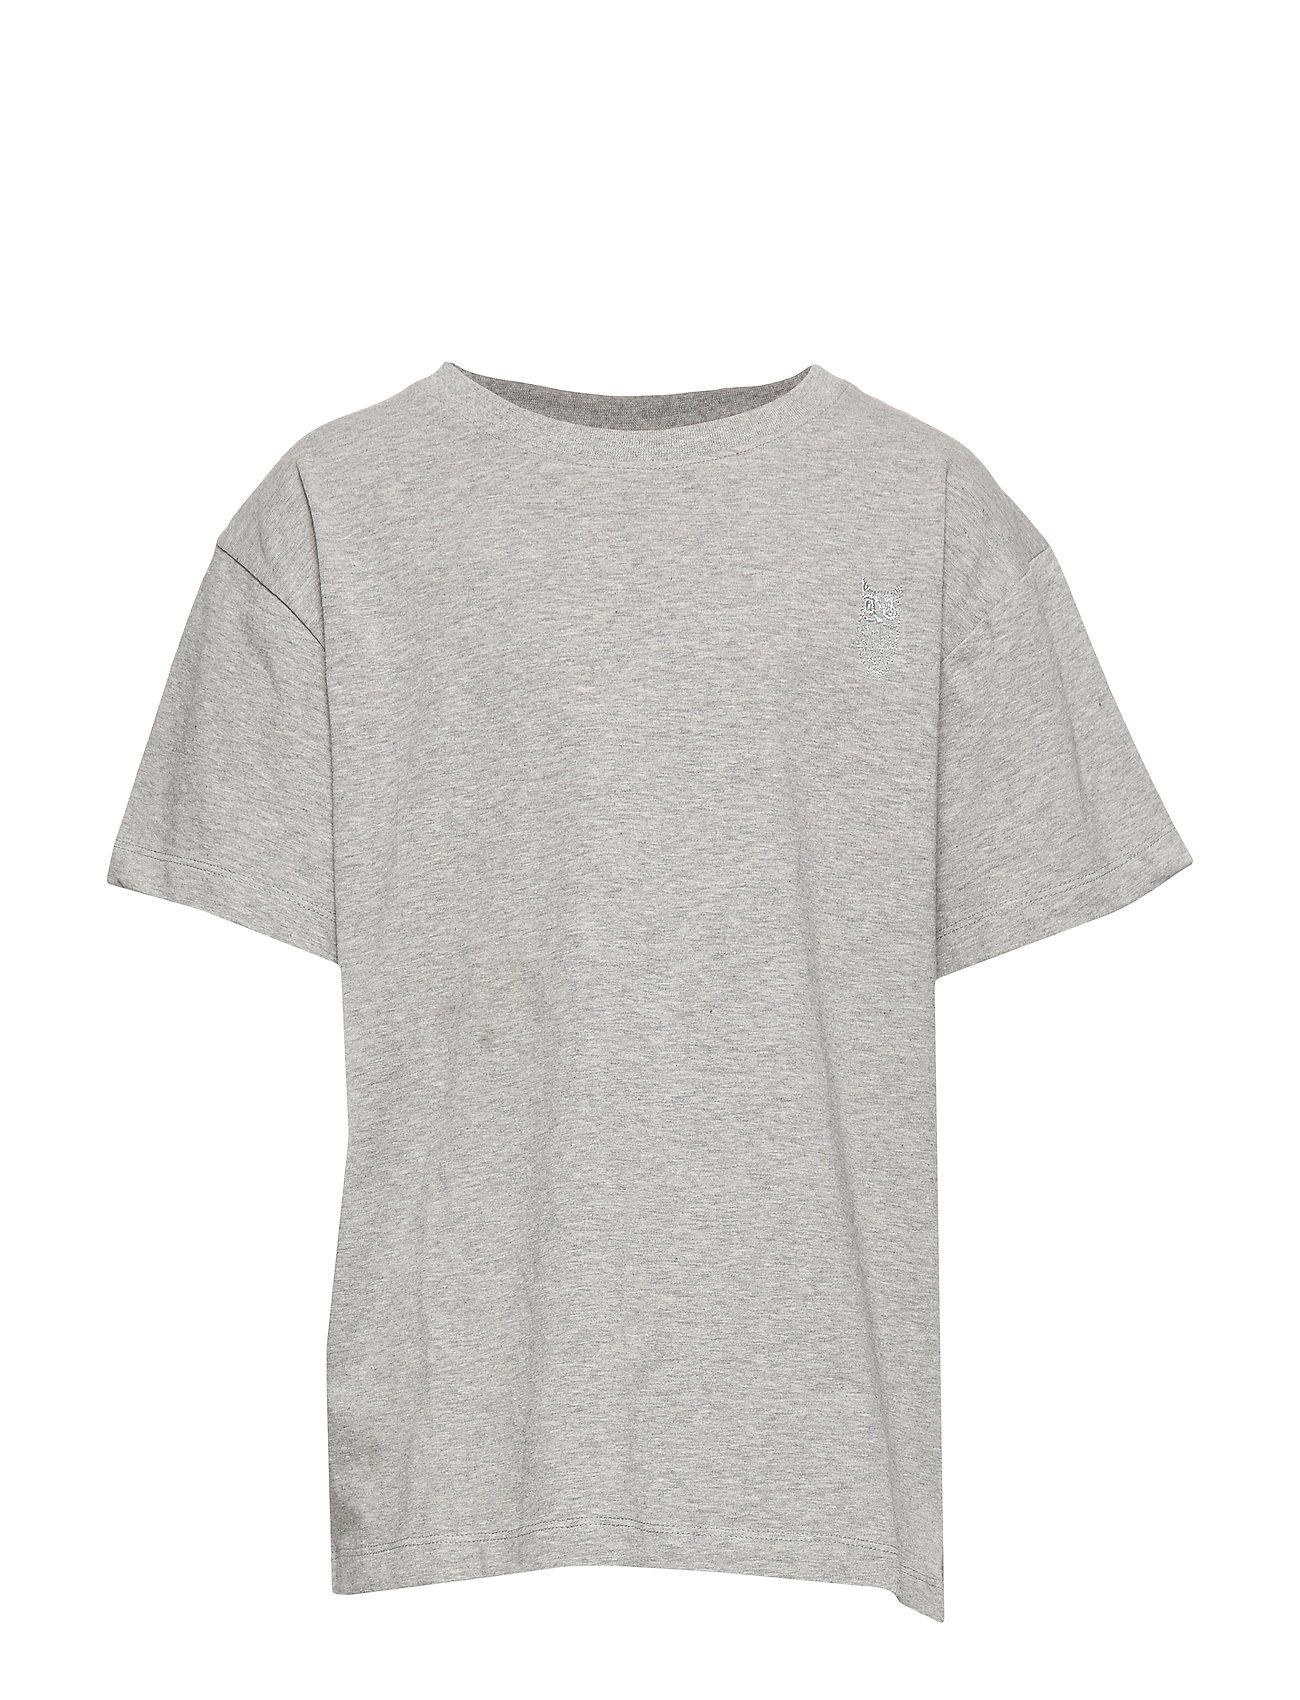 Soft Gallery Asger T-shirt - GREY MELANGE, MINI OWL EMB.